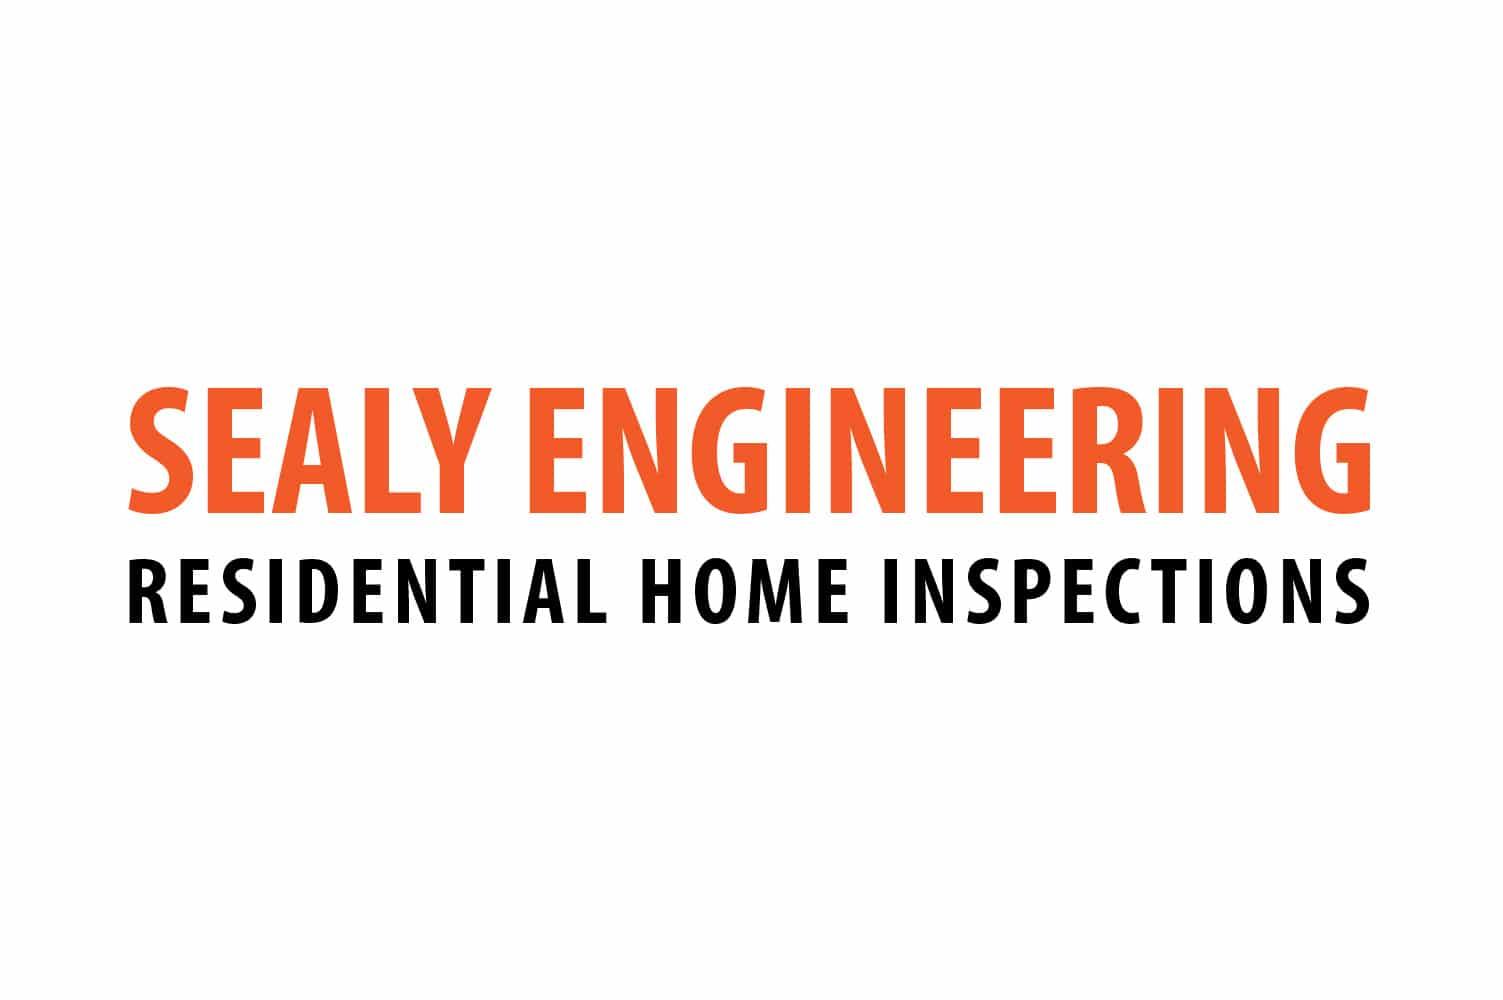 sealy-engineering-logo-design